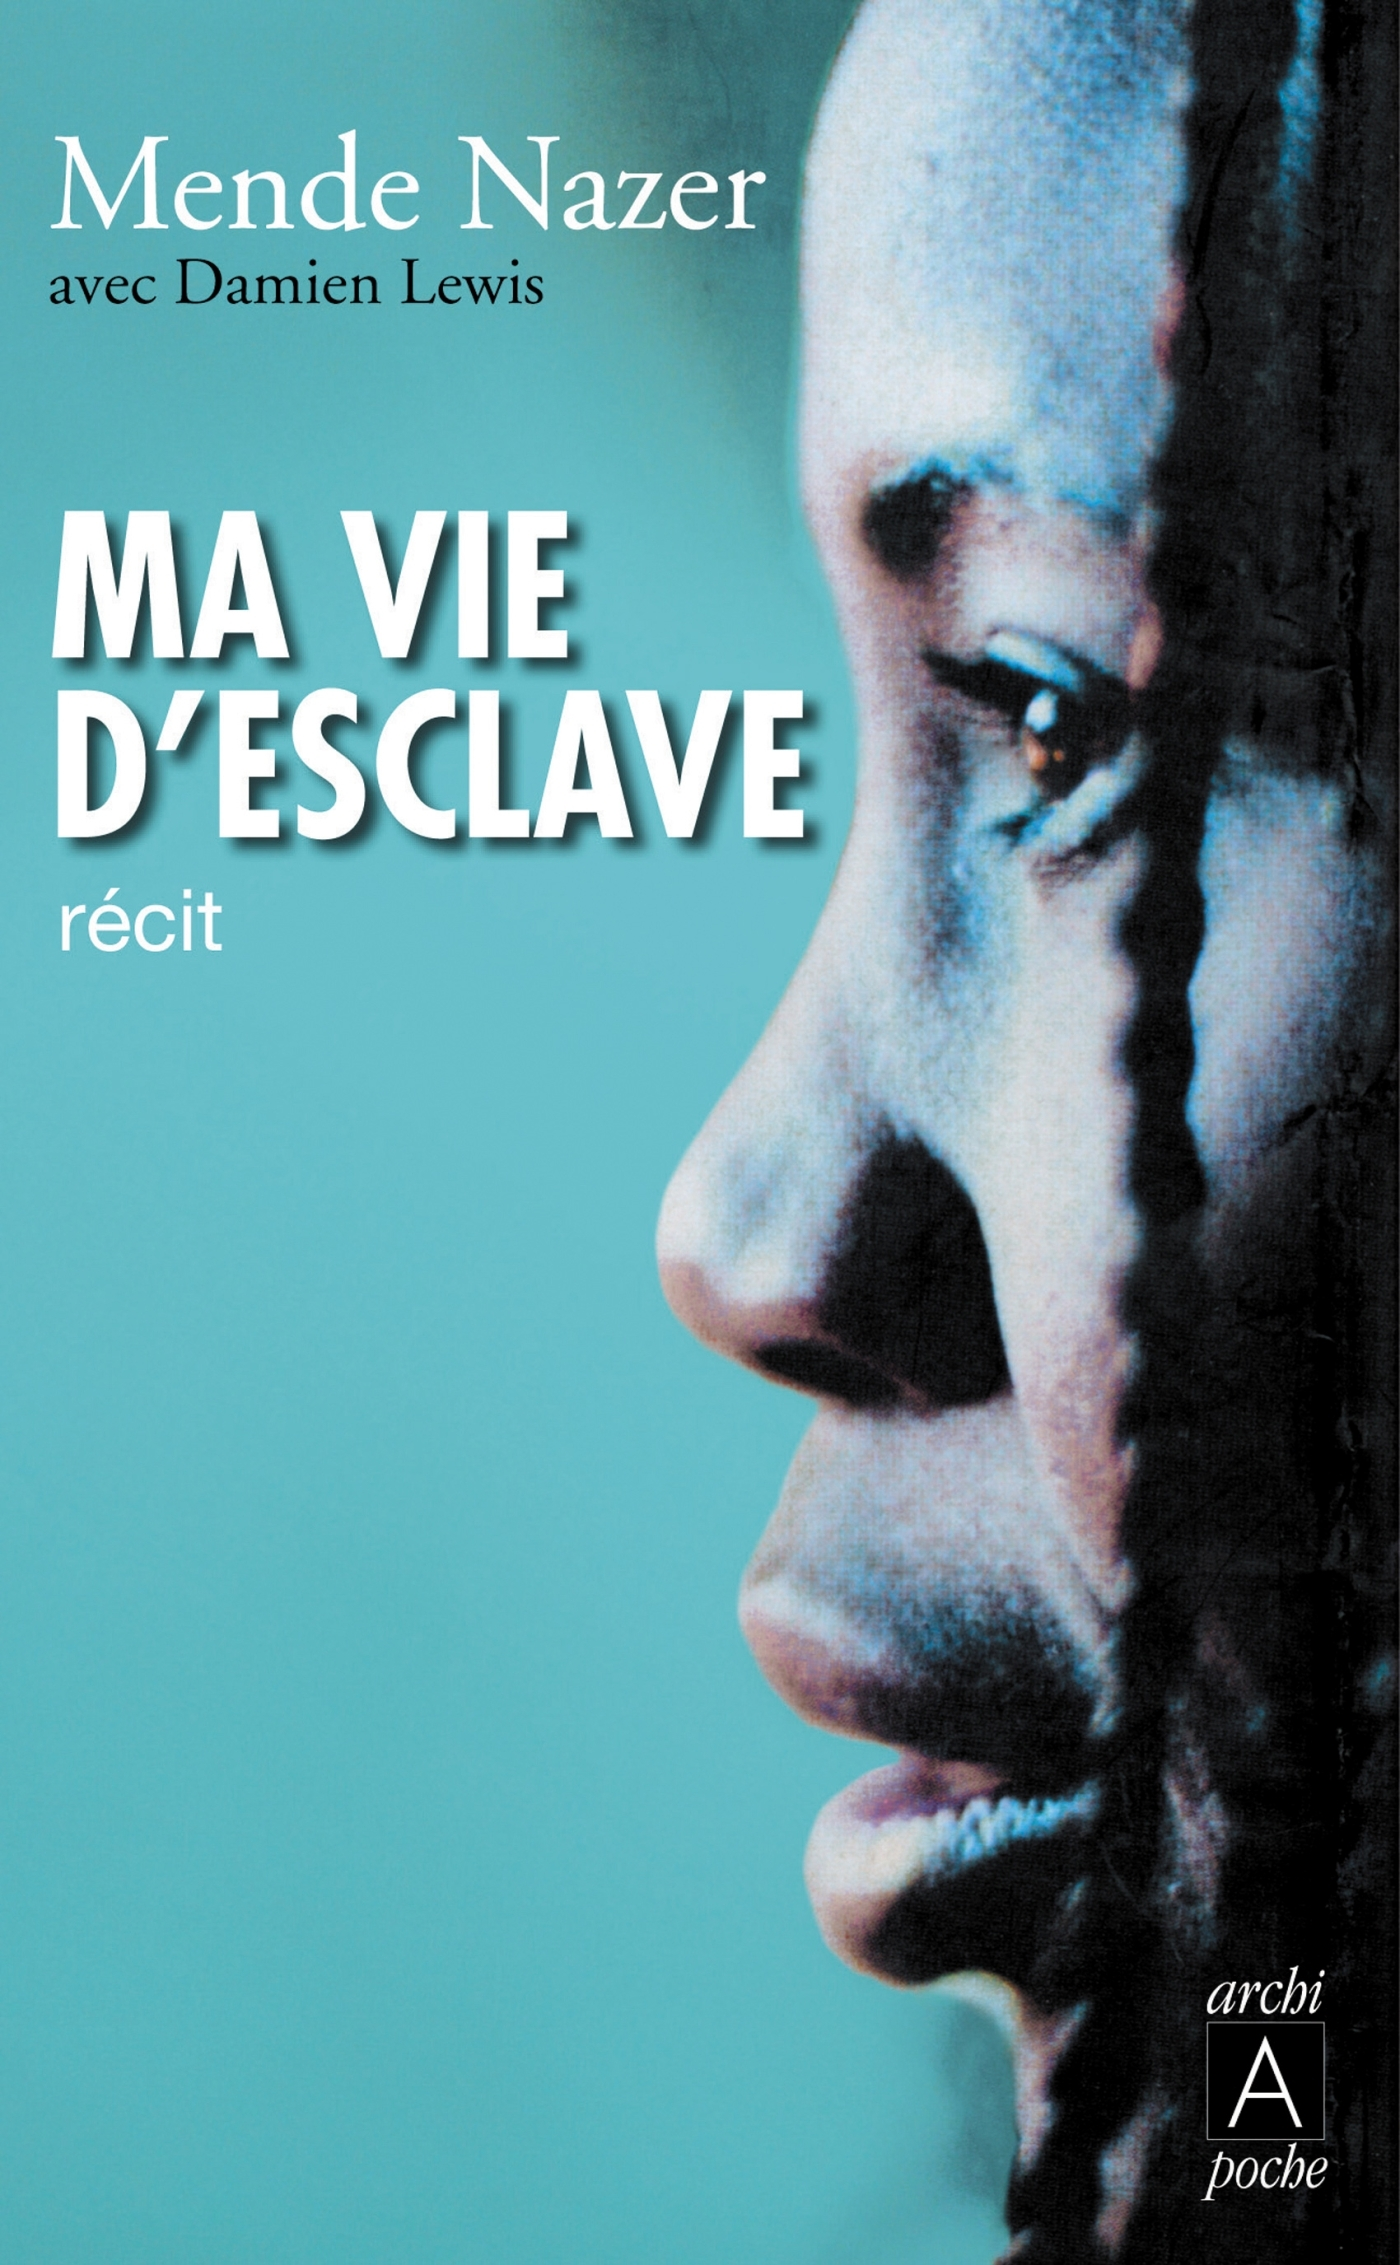 MA VIE D'ESCLAVE